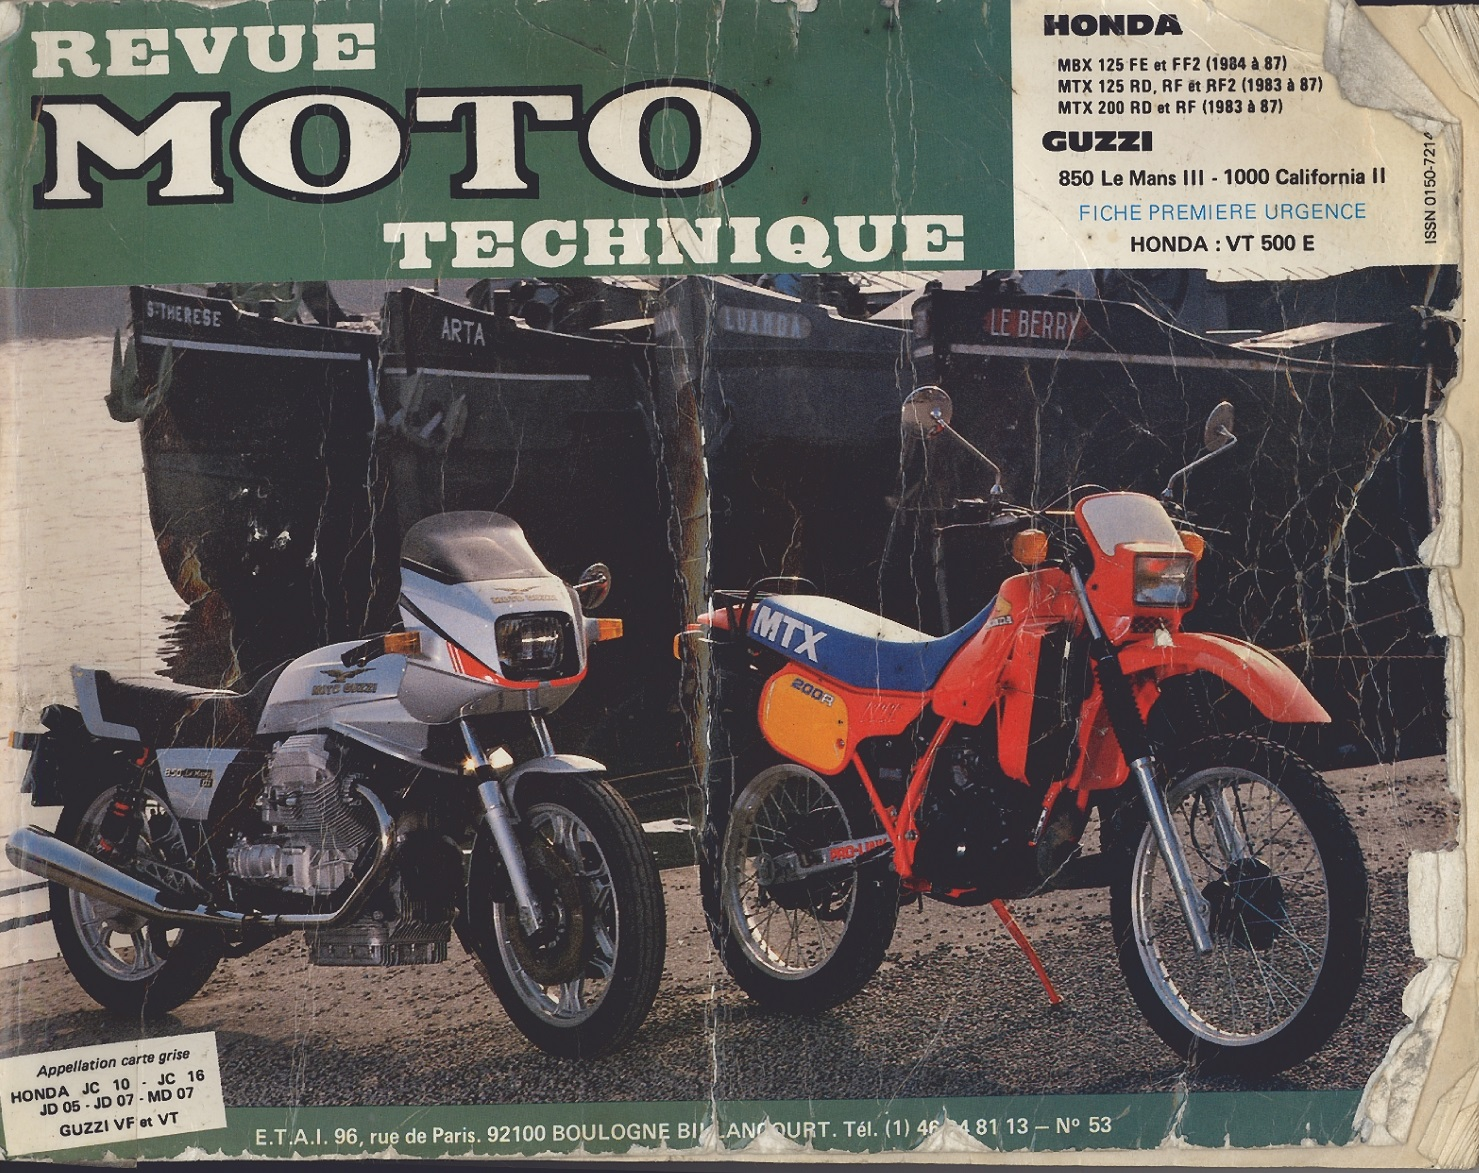 Workshop Manual for Honda MBX125FF2 (1984-1987)